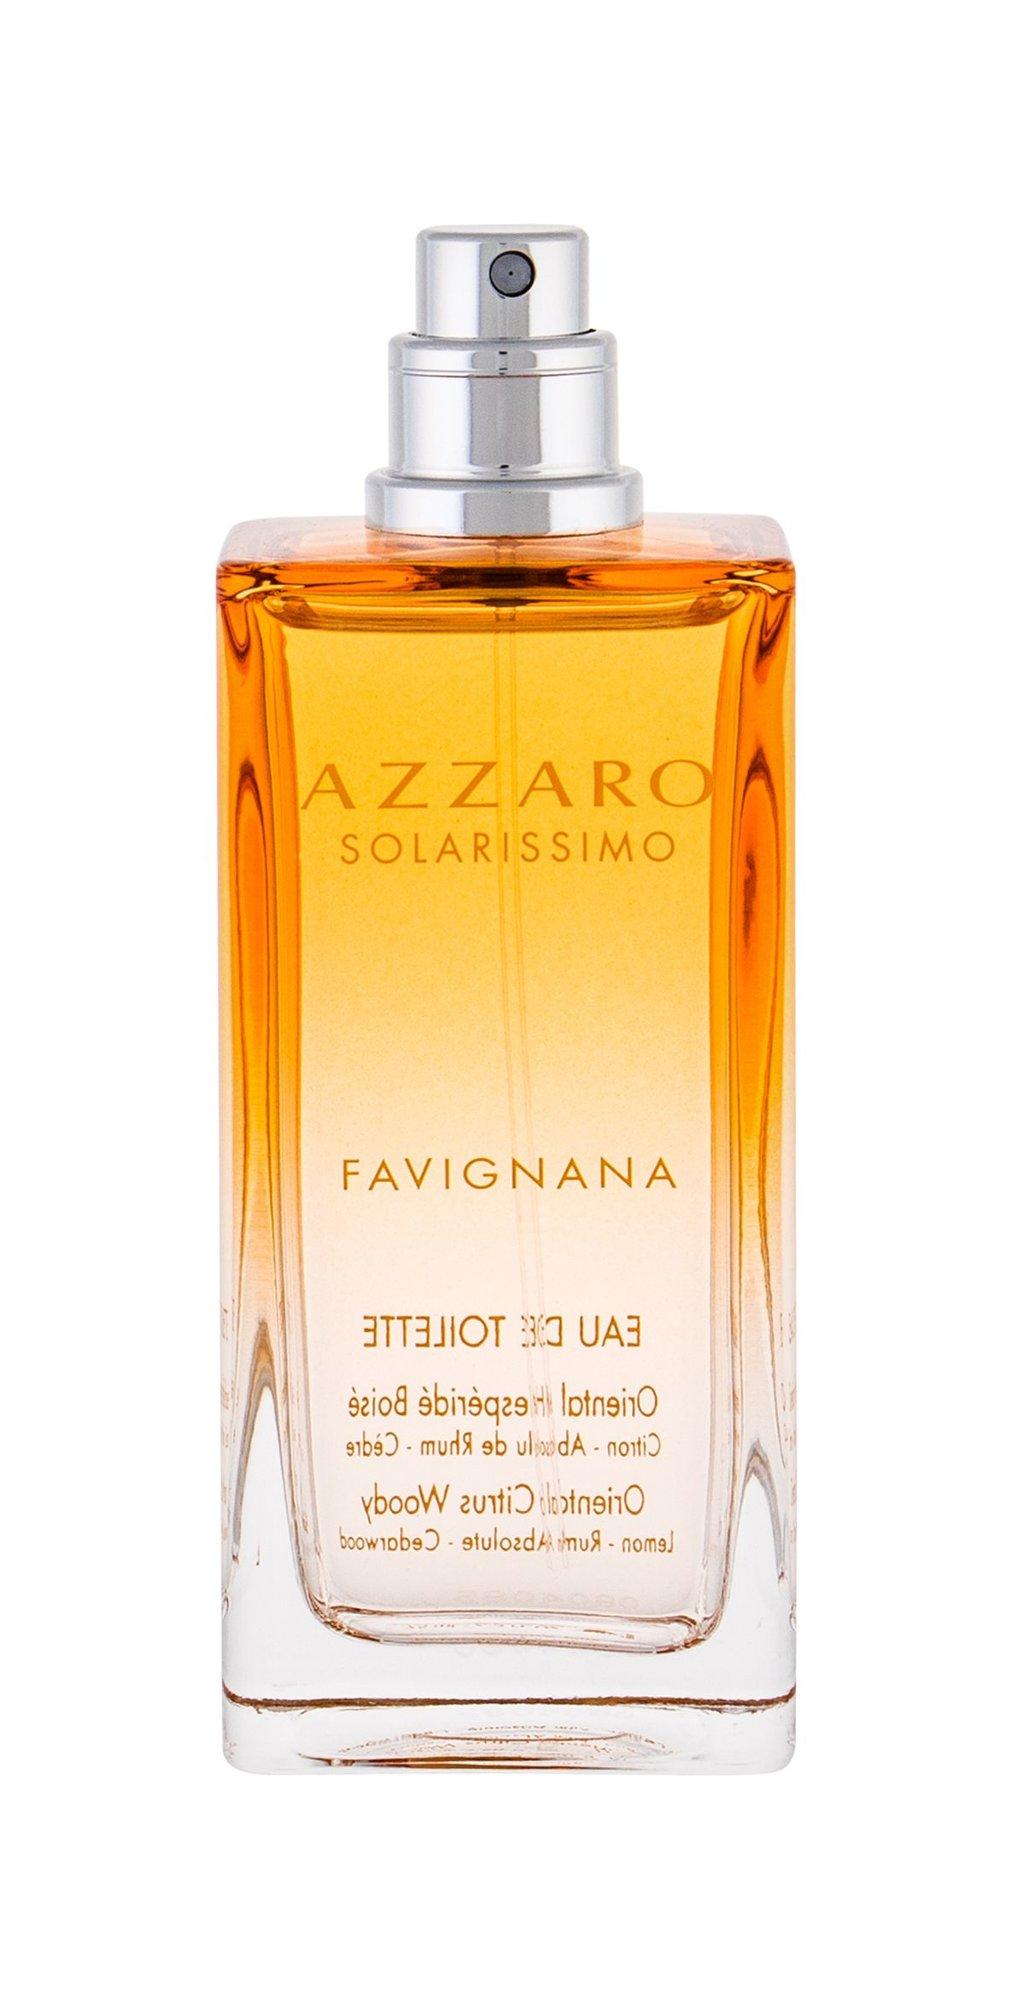 Azzaro Solarissimo Favignana, Toaletná voda 75ml, Tester